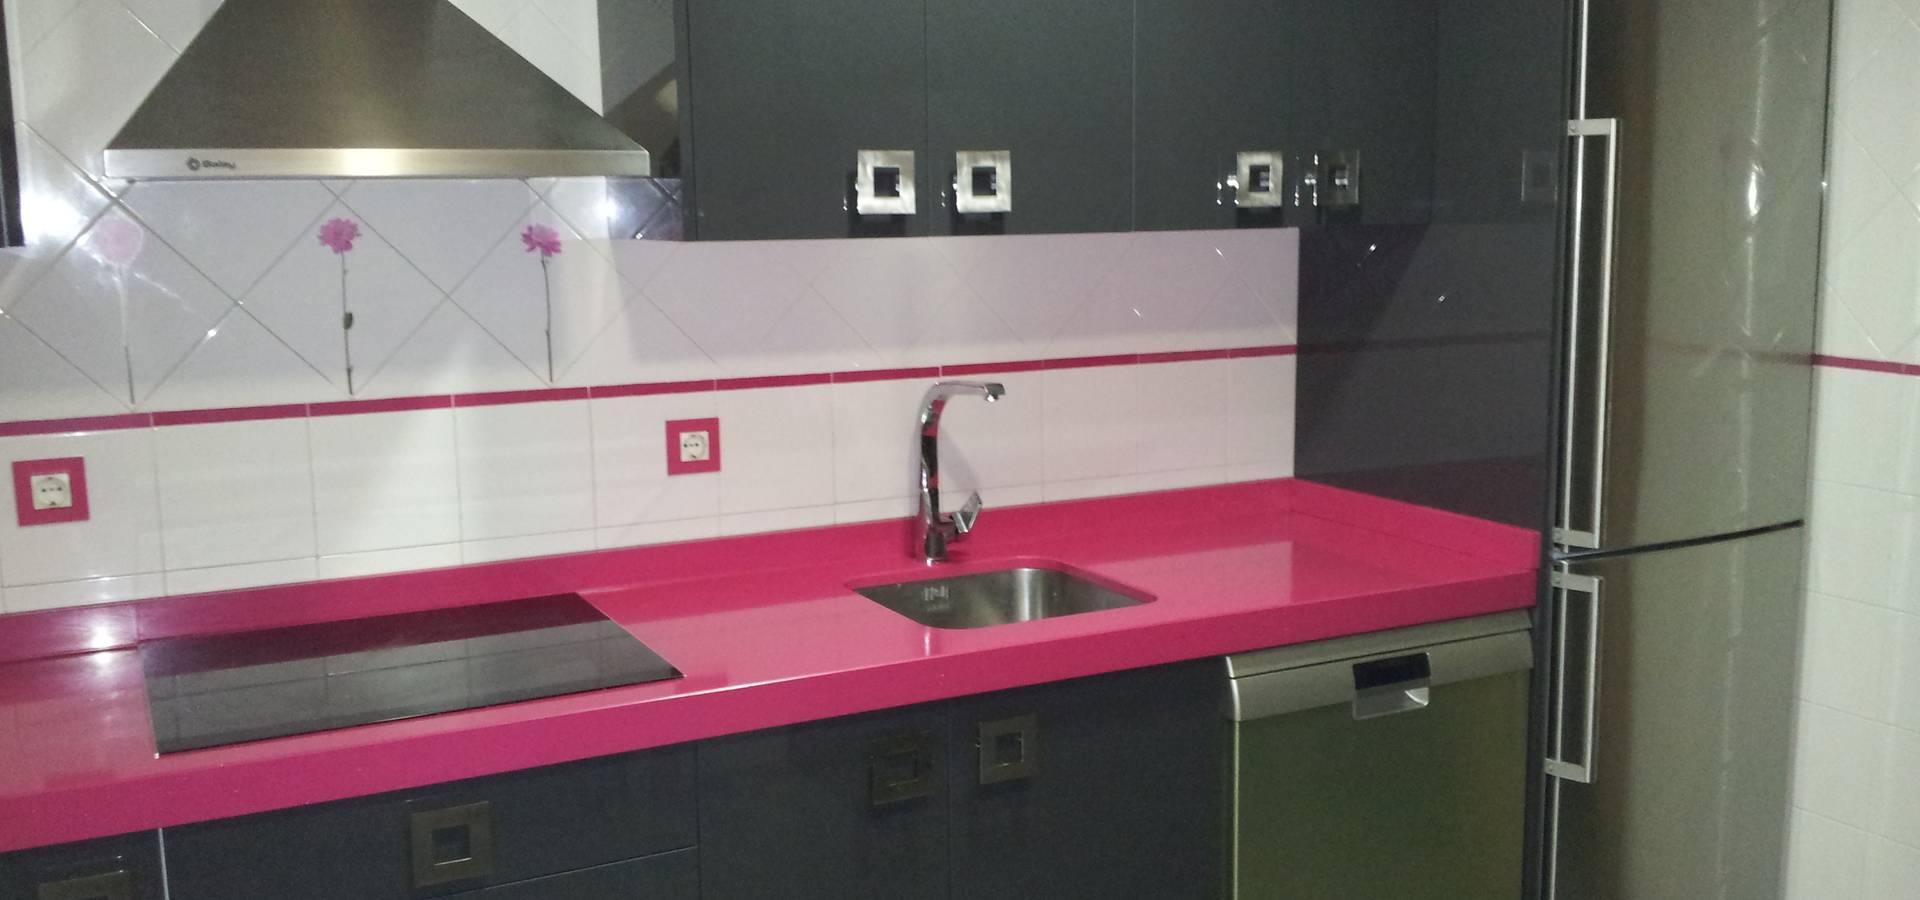 Dise adores de cocinas en madrid - Disenadores de cocinas ...